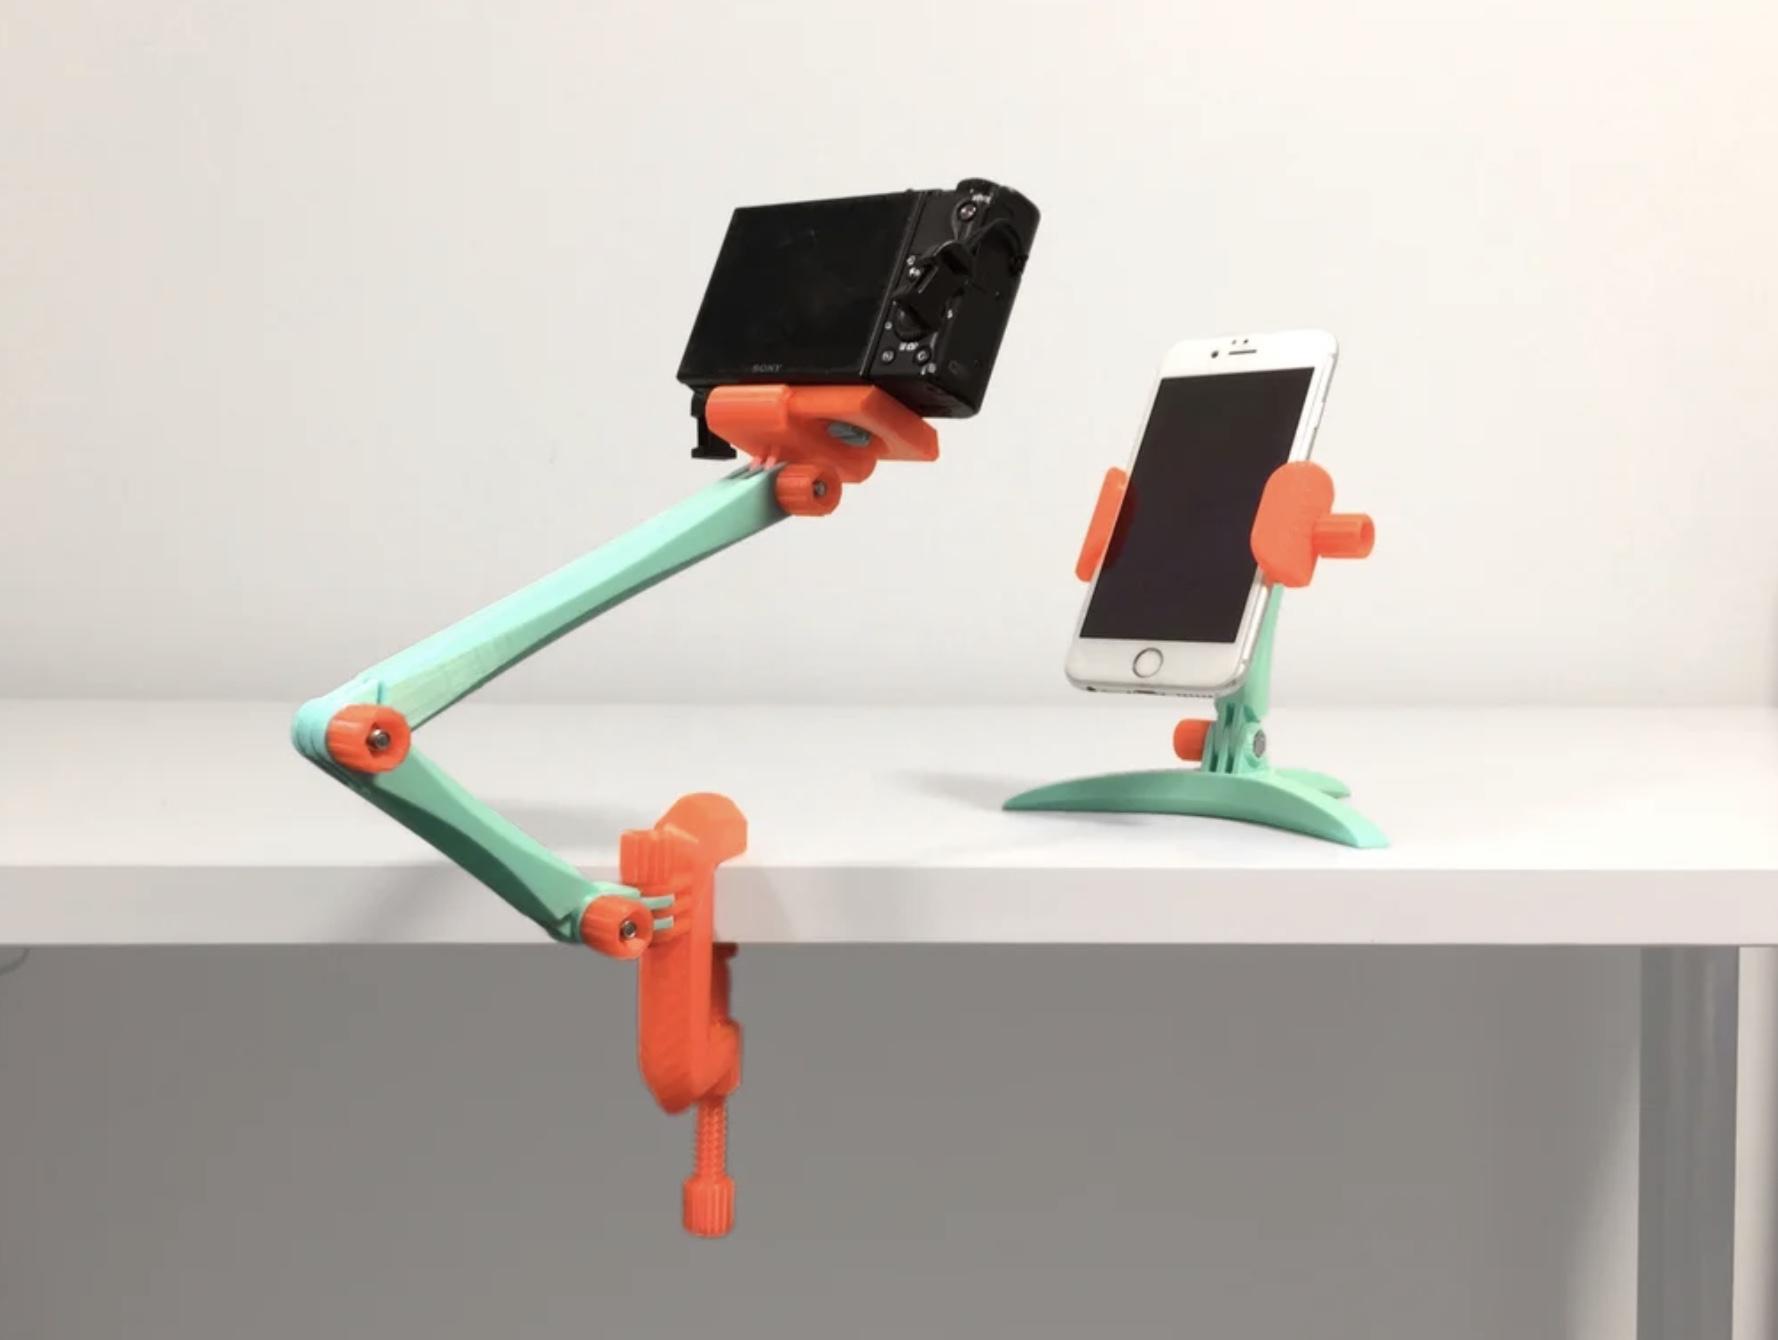 Modulárny systém pre iPhone a iné produkty